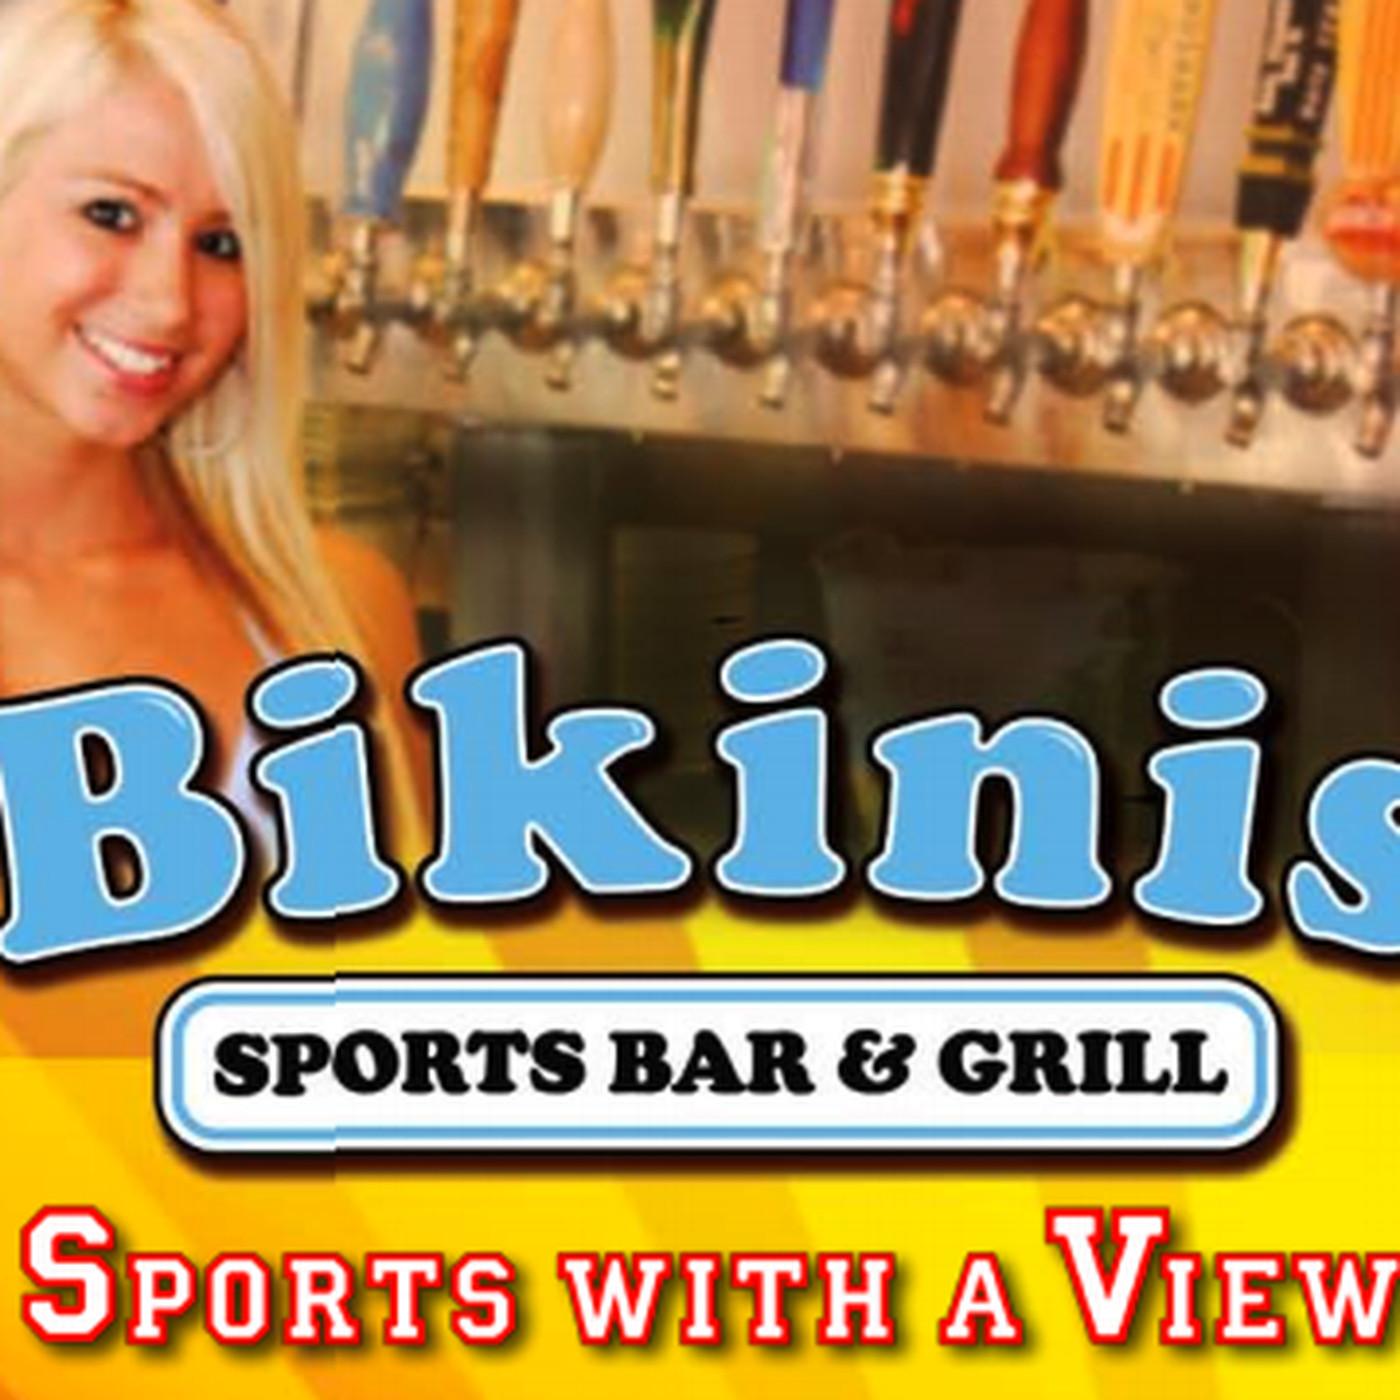 Bikini bars in tennessee